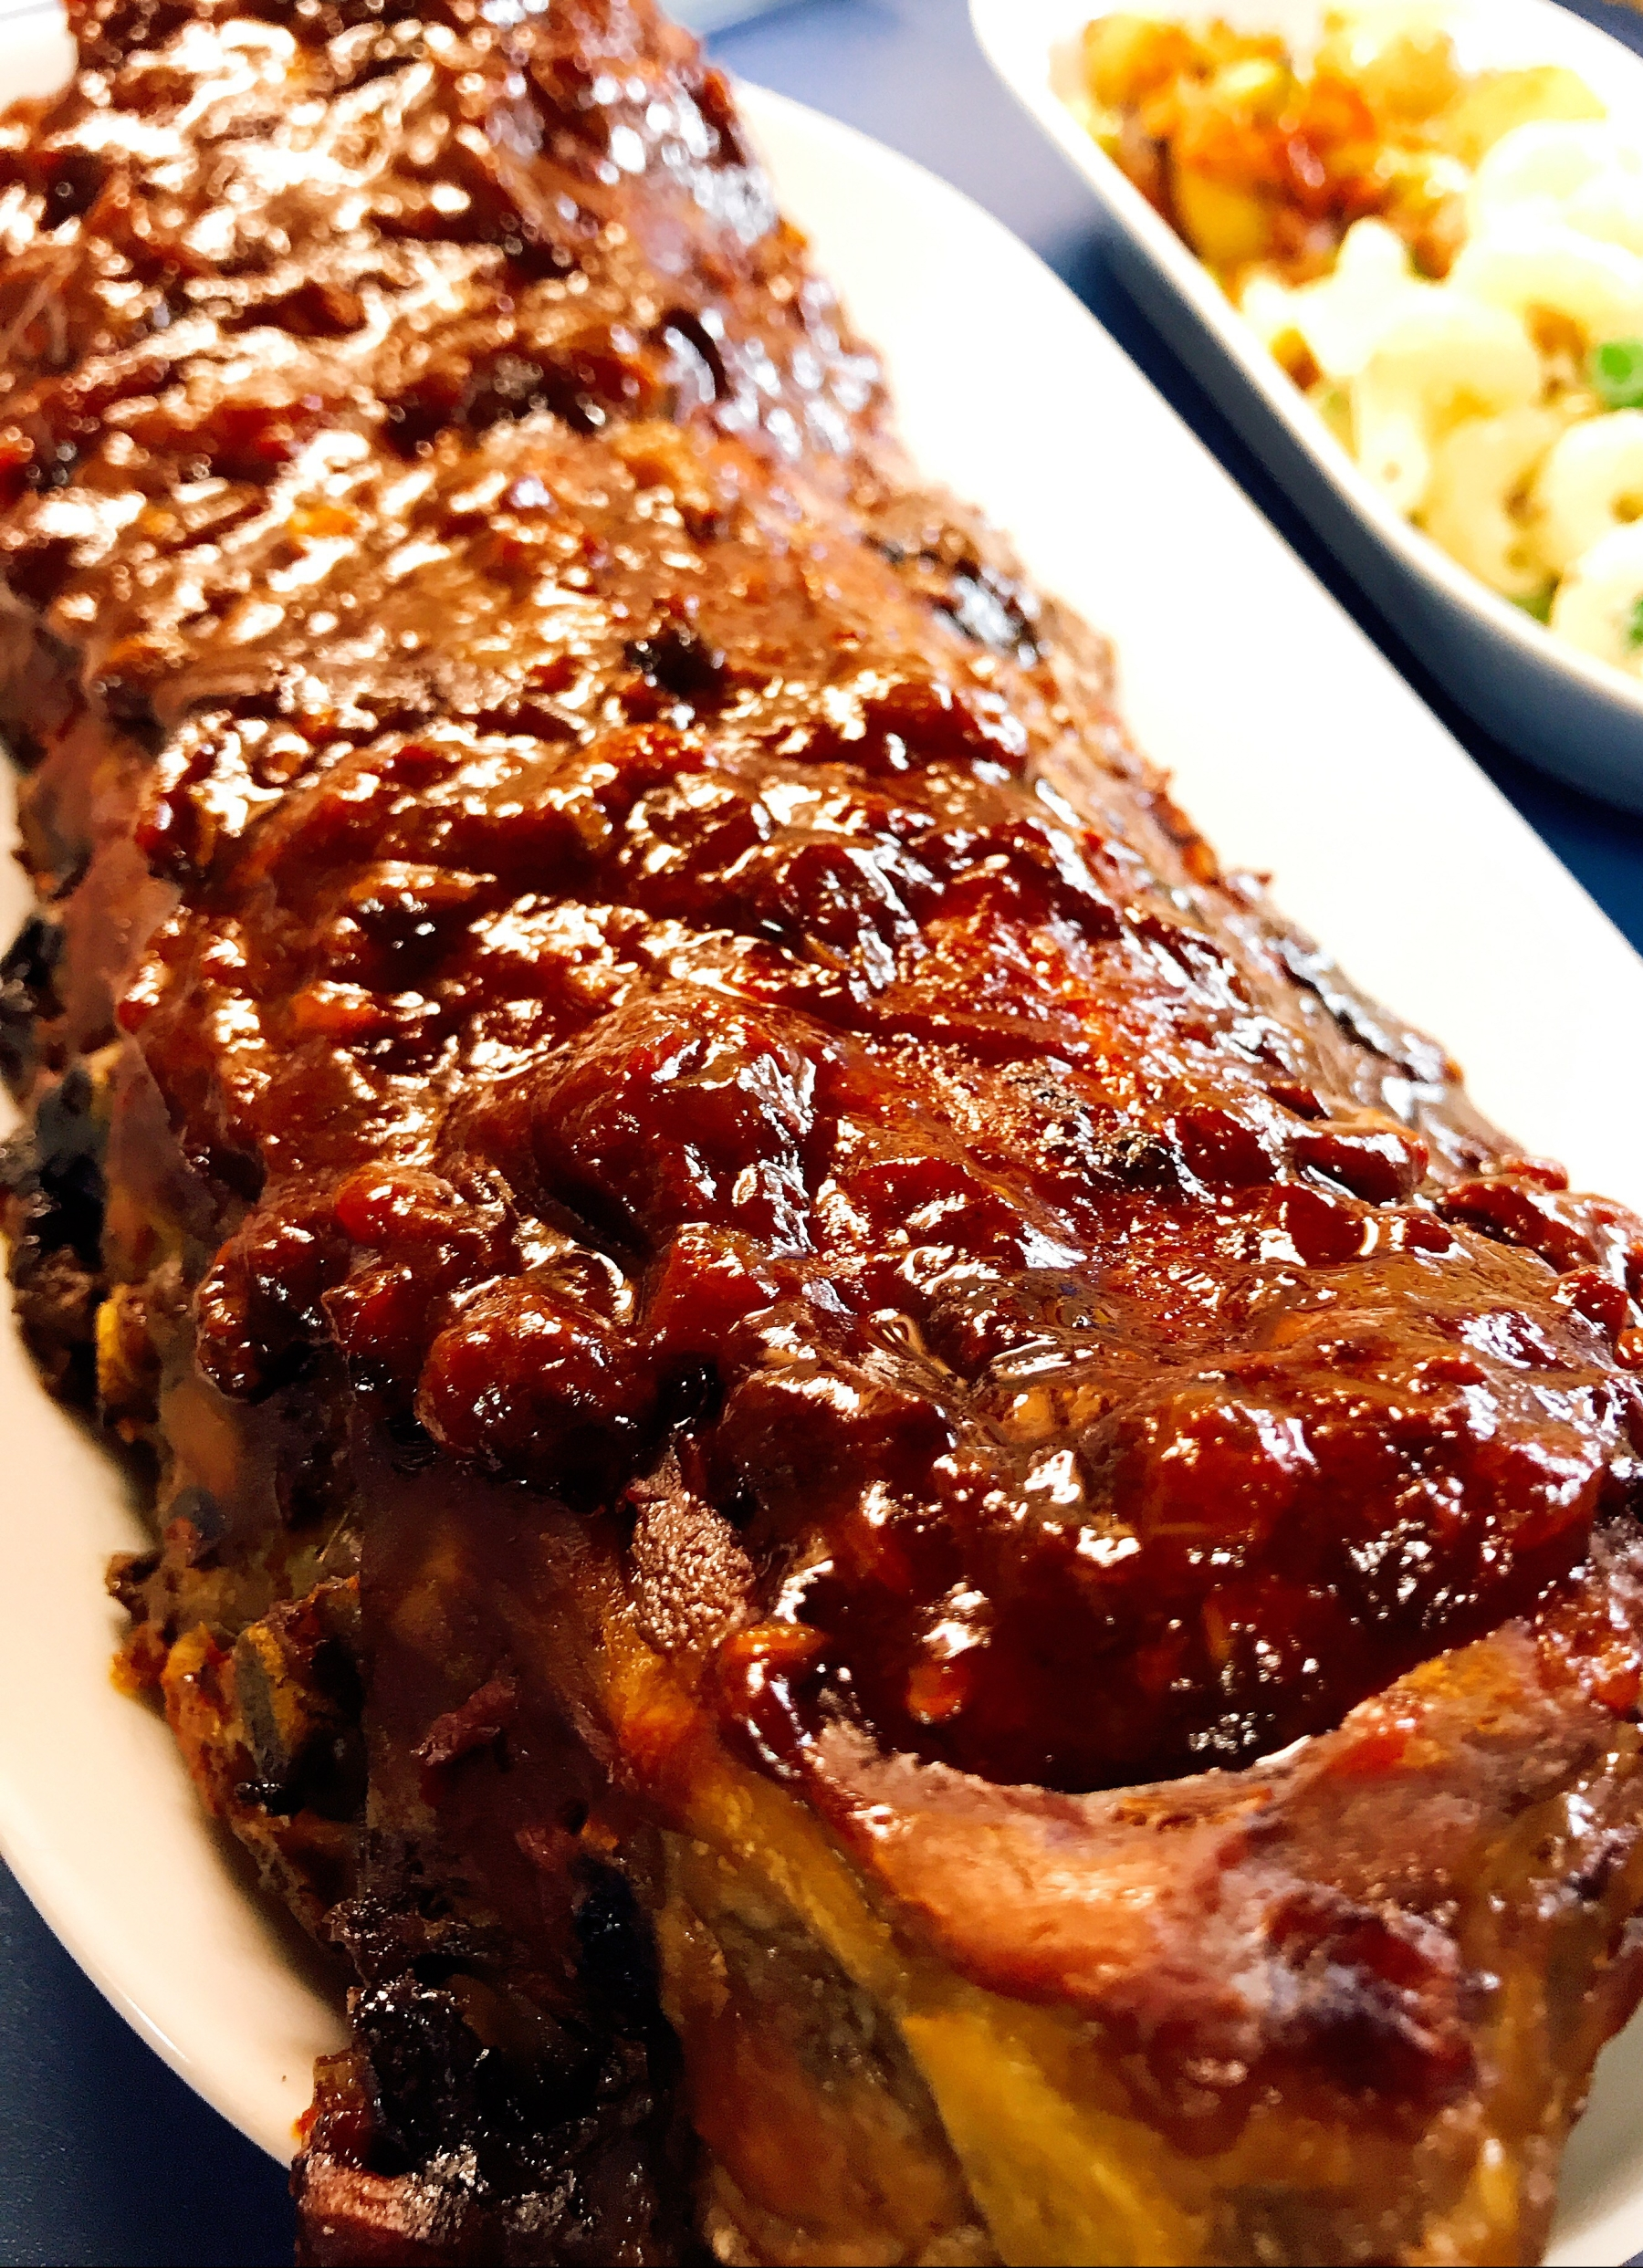 Homemade Pork Ribs